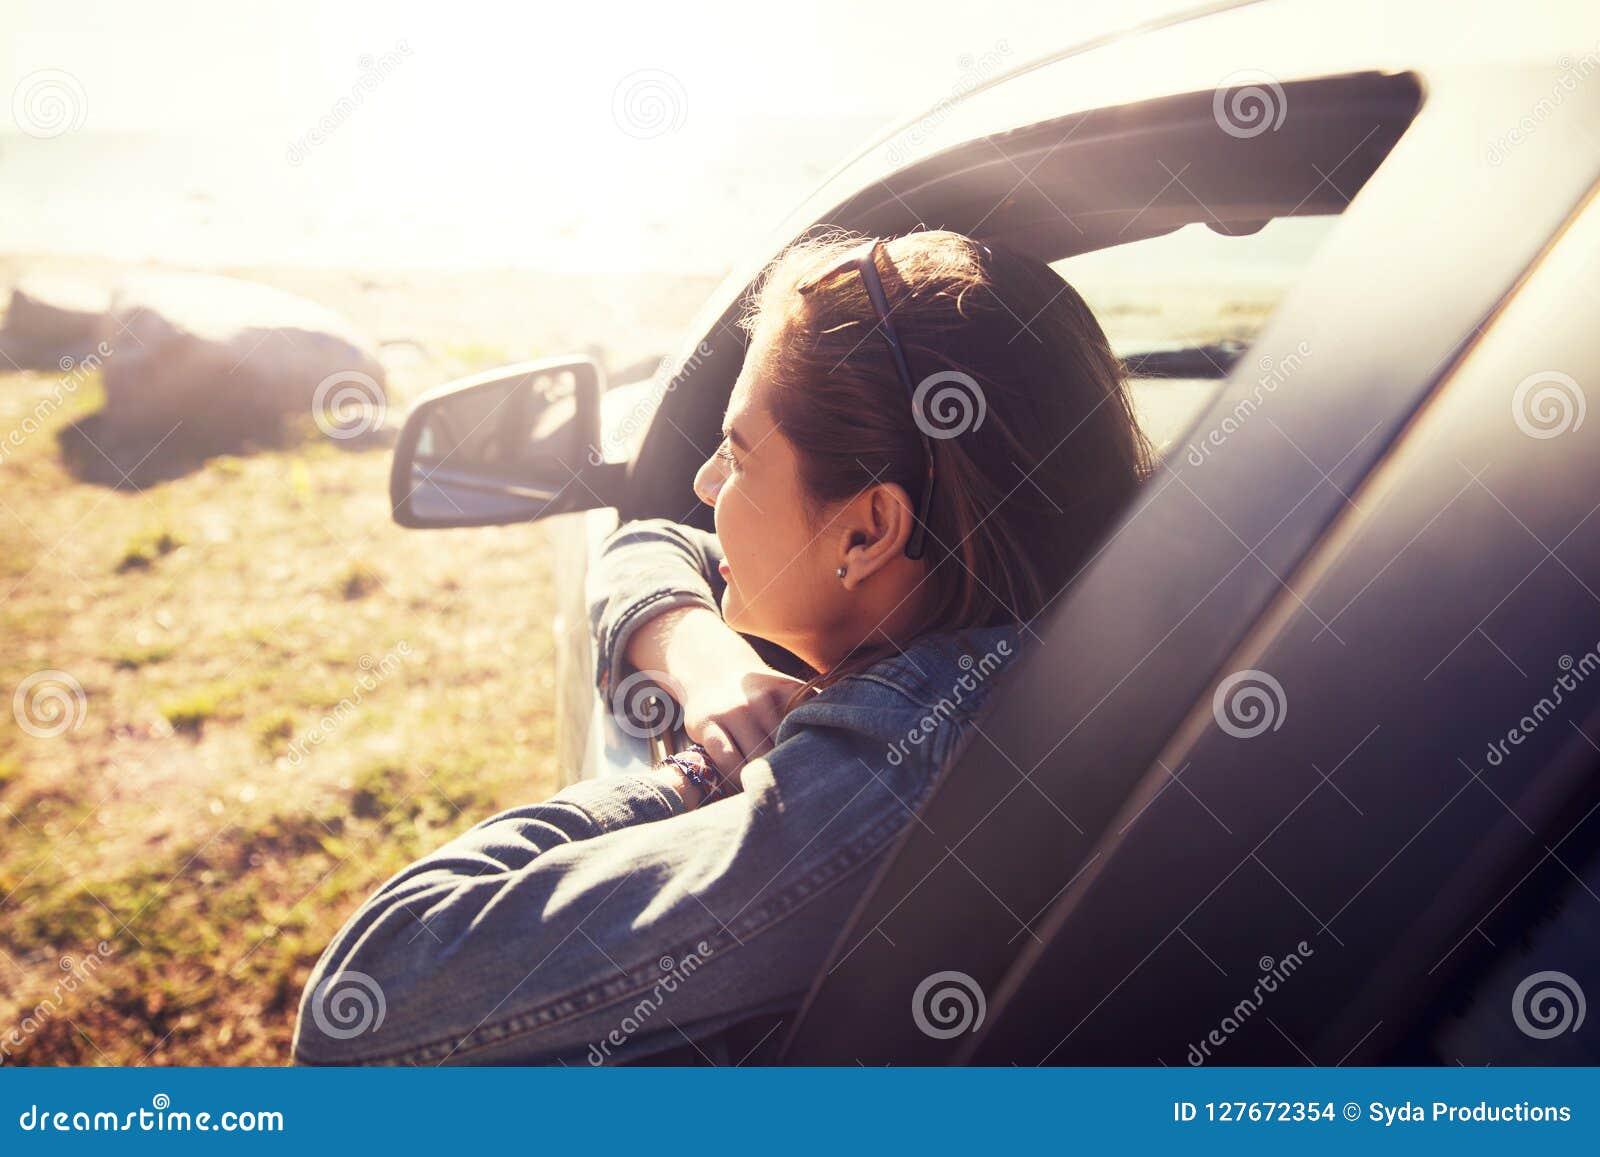 Adolescente ou jeune femme heureuse dans la voiture